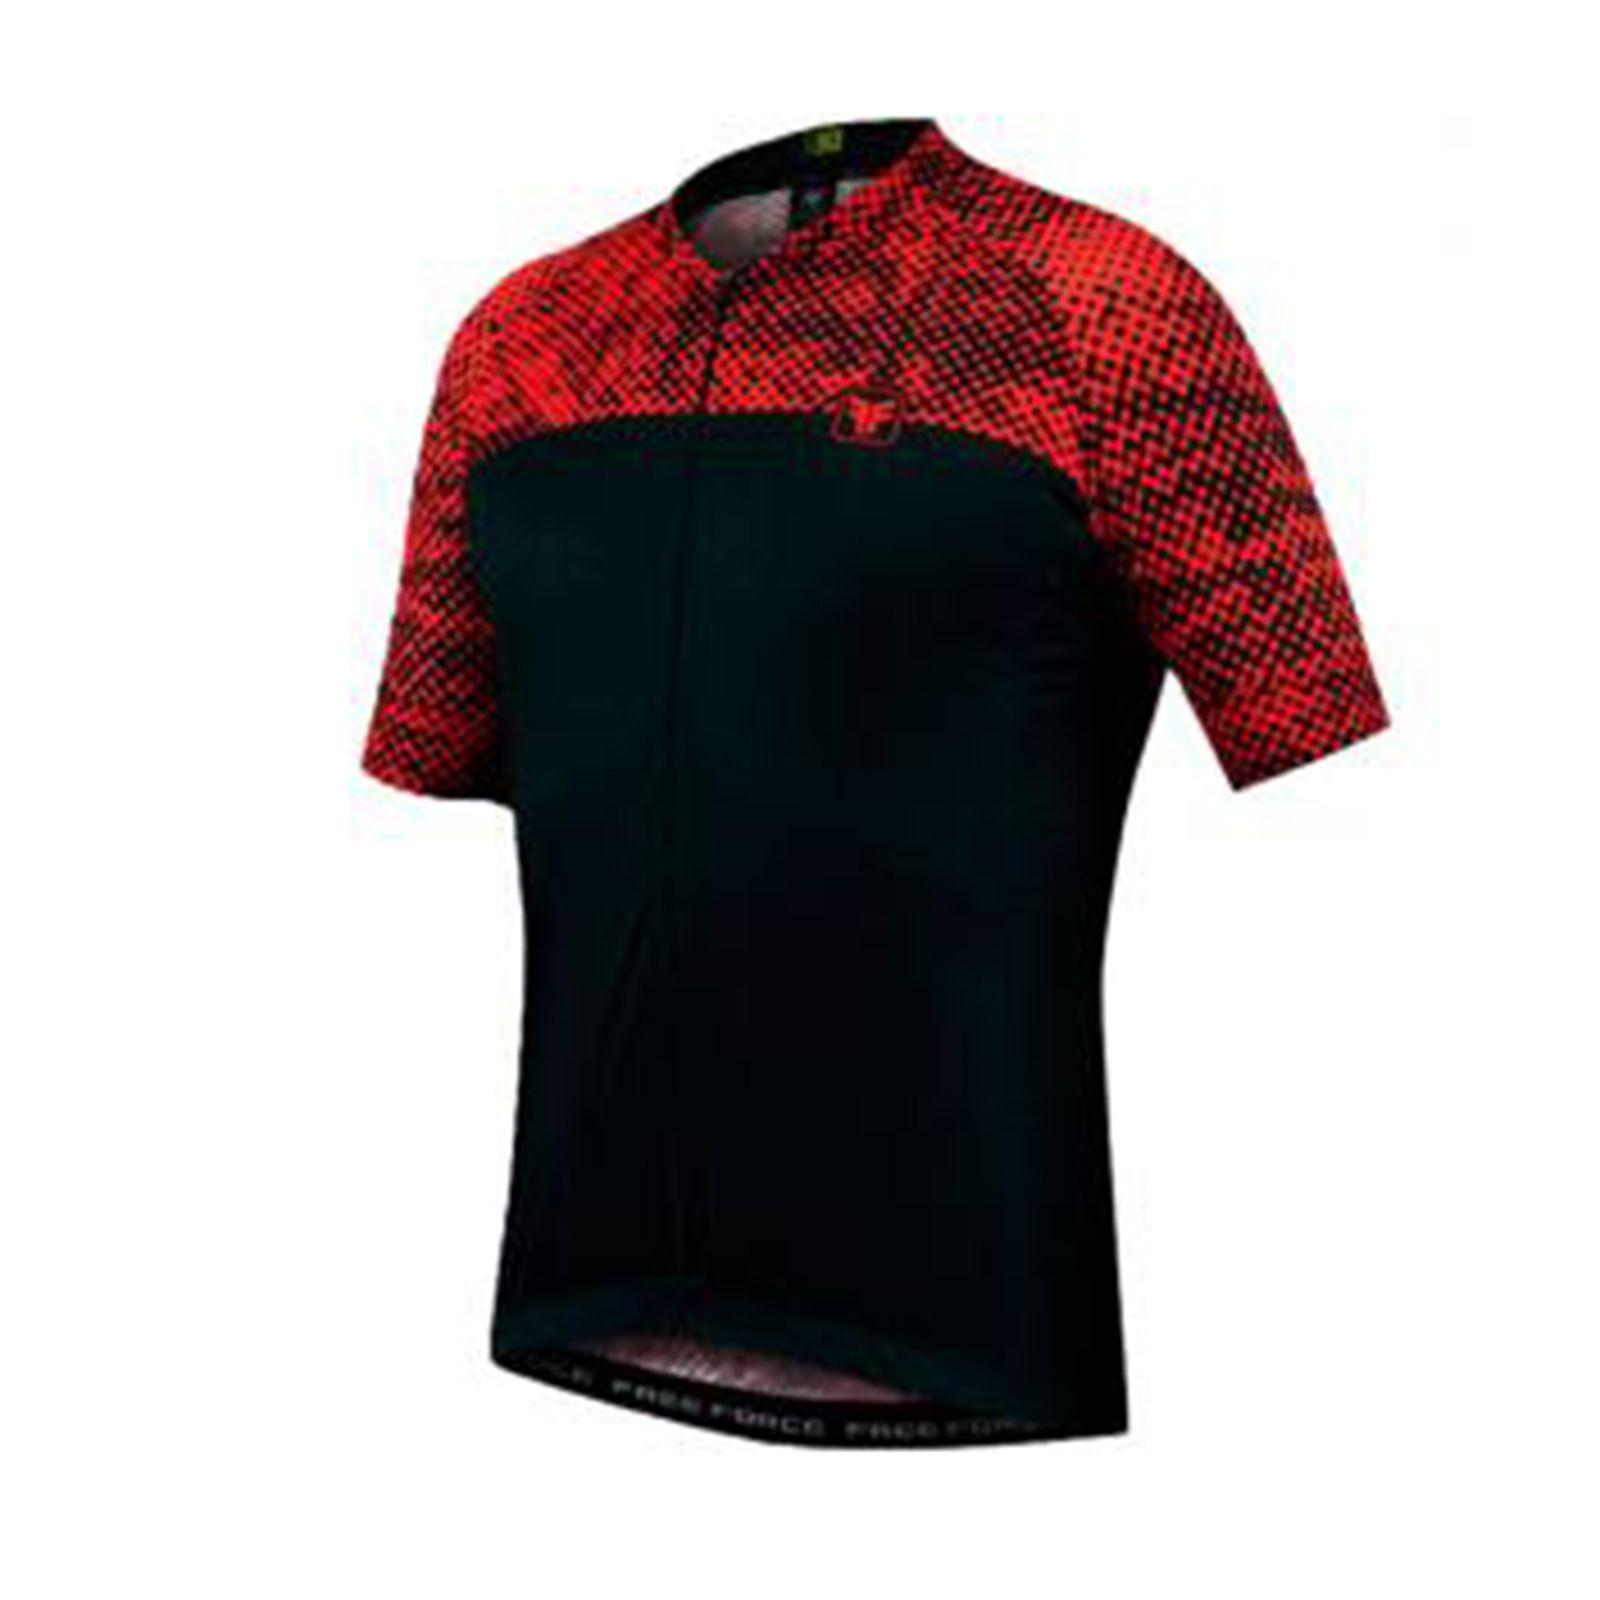 Camiseta Masculina Sport Halftone - Preto/Vermelho - Free Force